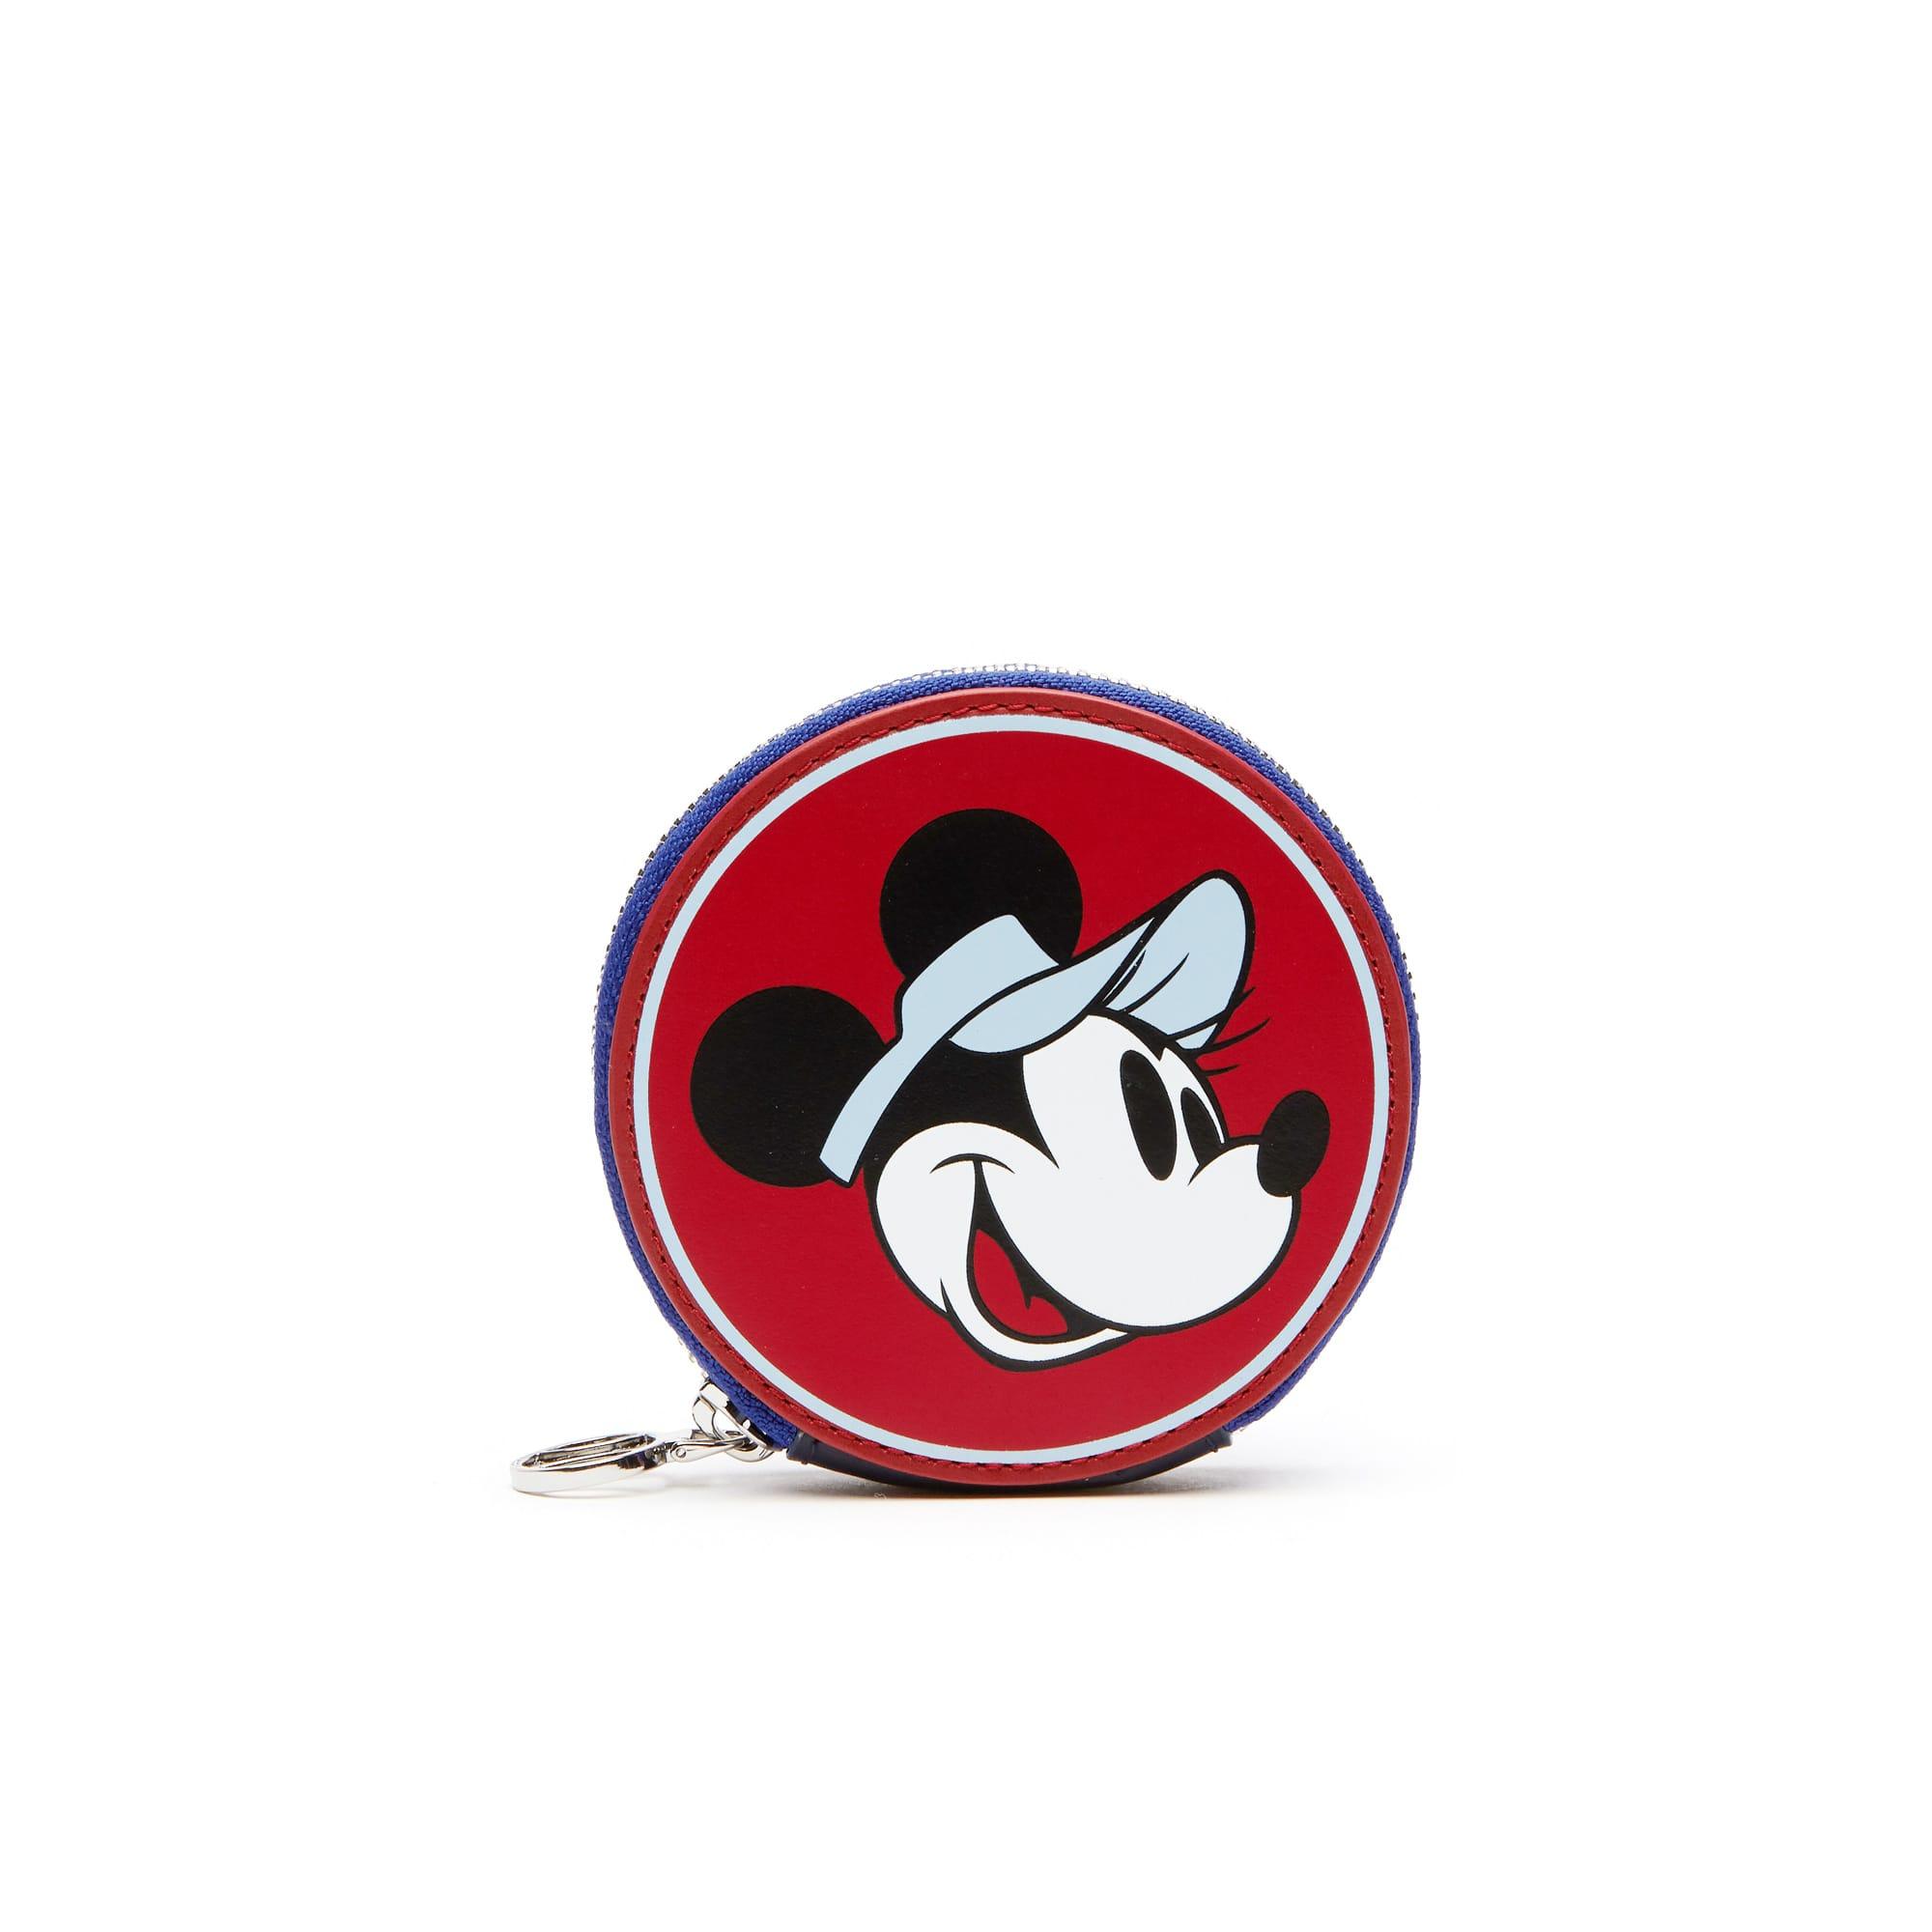 Porte-monnaie Holiday Collector en cuir imprimé Minnie Collab Disney